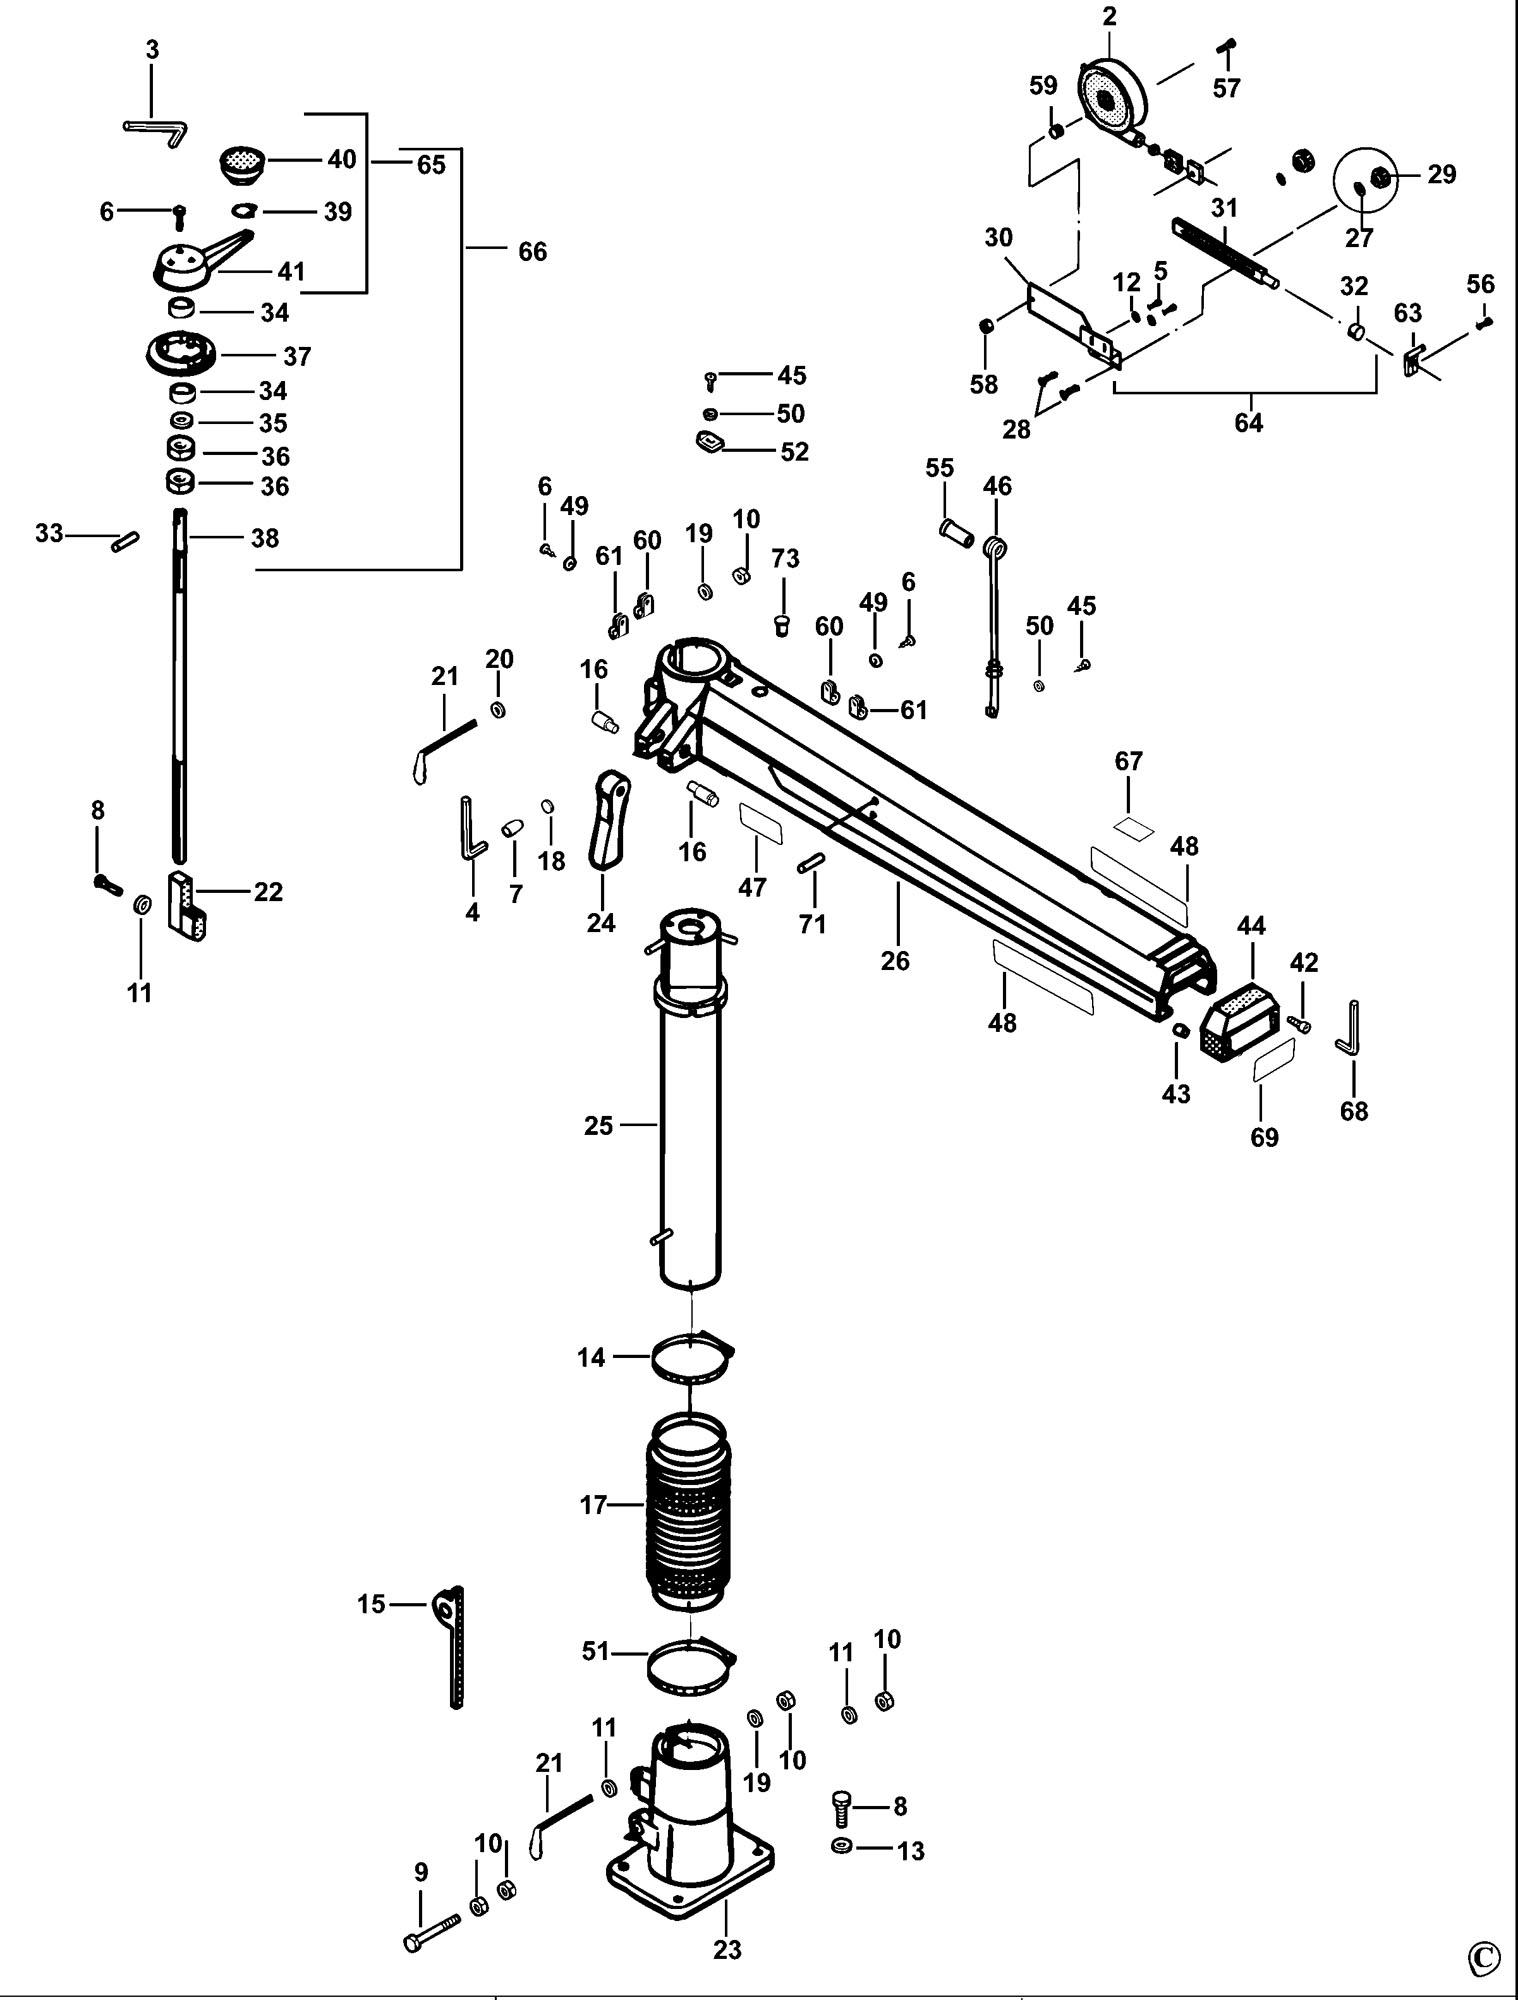 Spares For Dewalt Dw729kn Radial Arm Saw Type 1 Spare